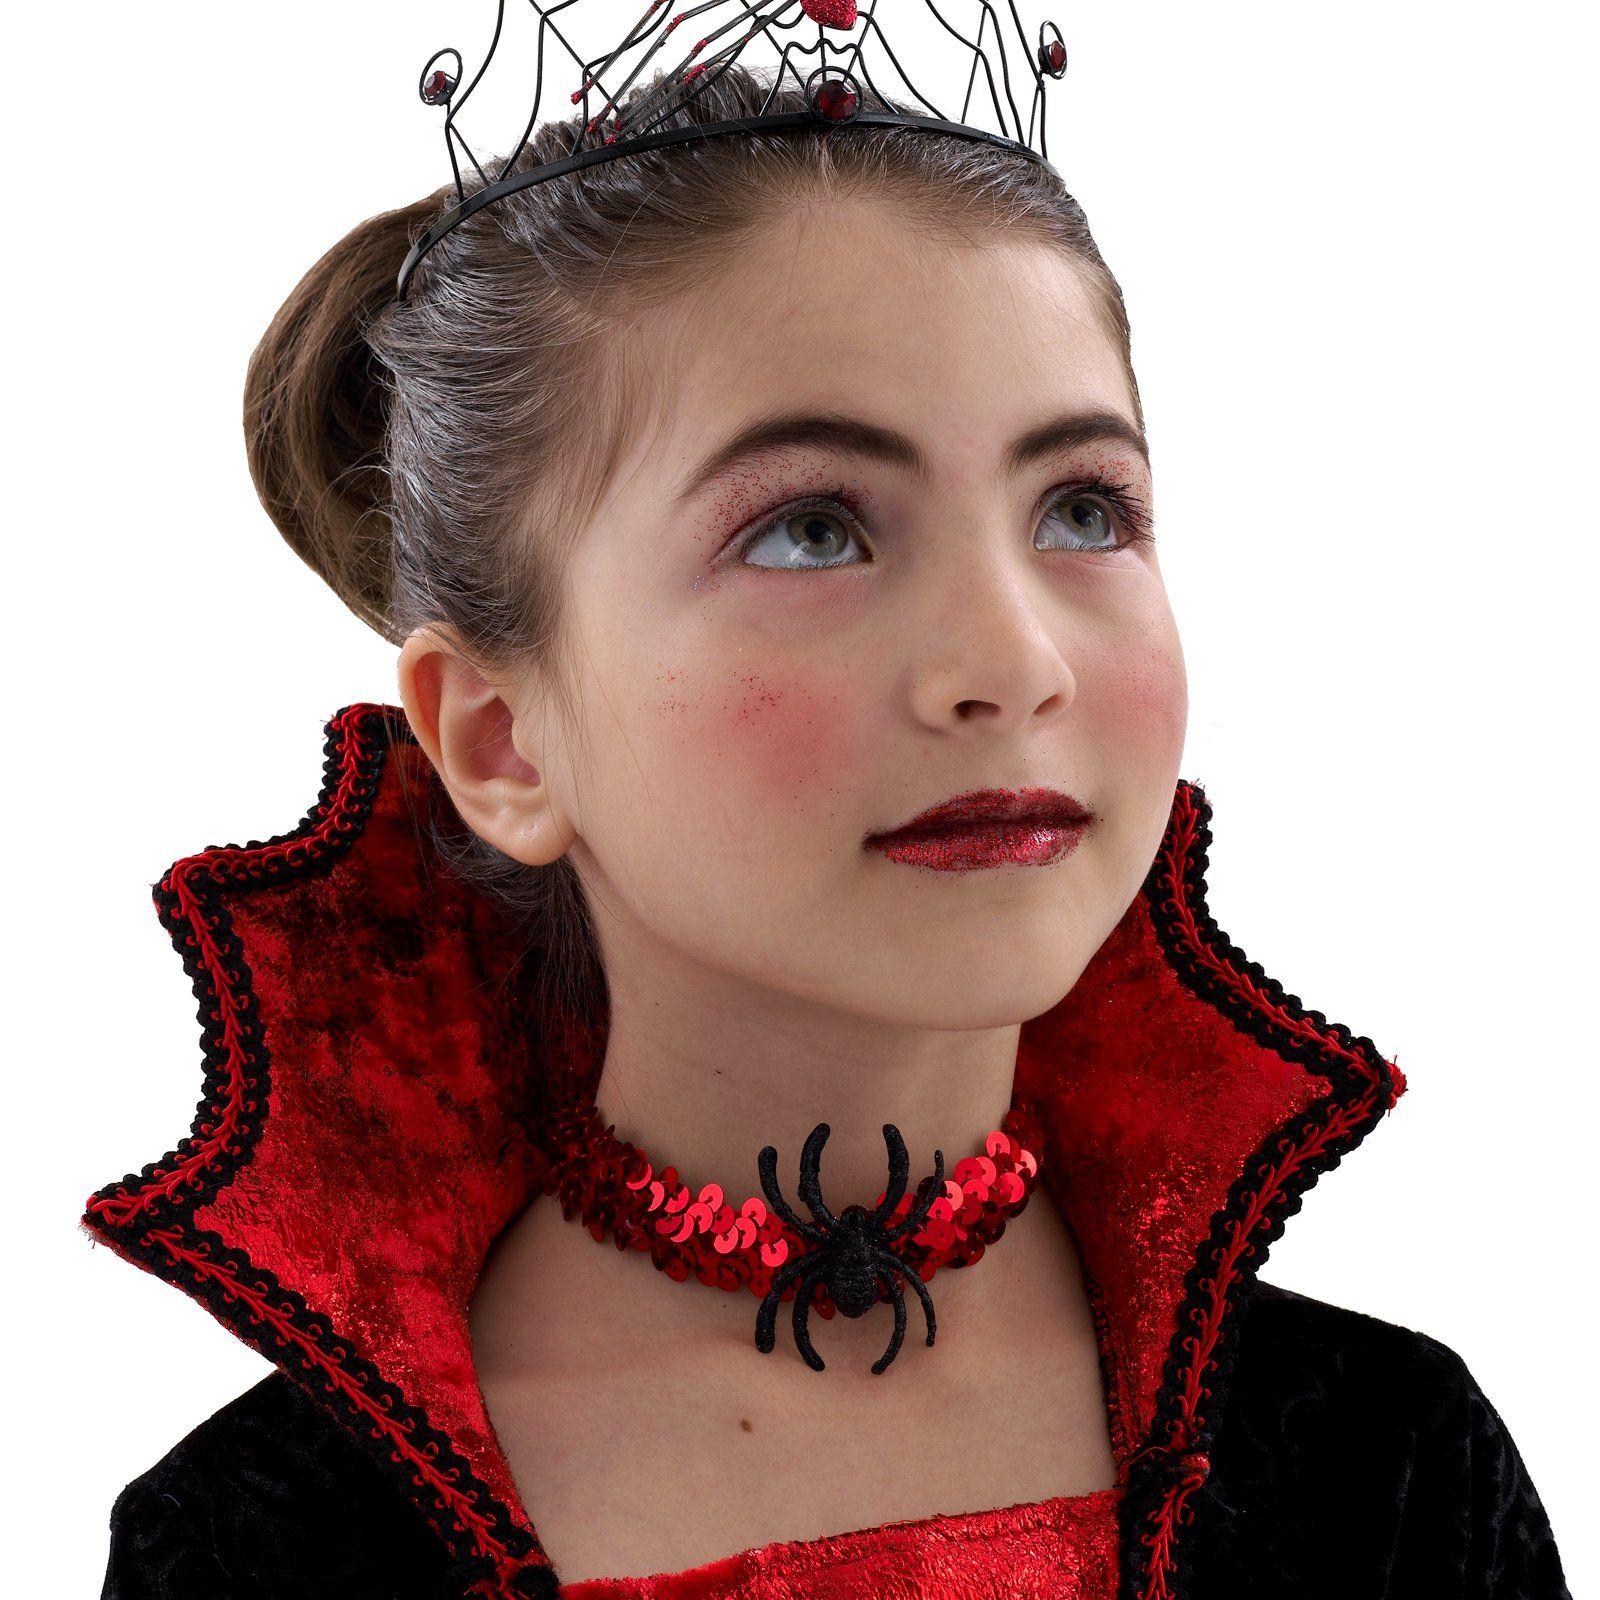 Dracula Child Choker from Halloween